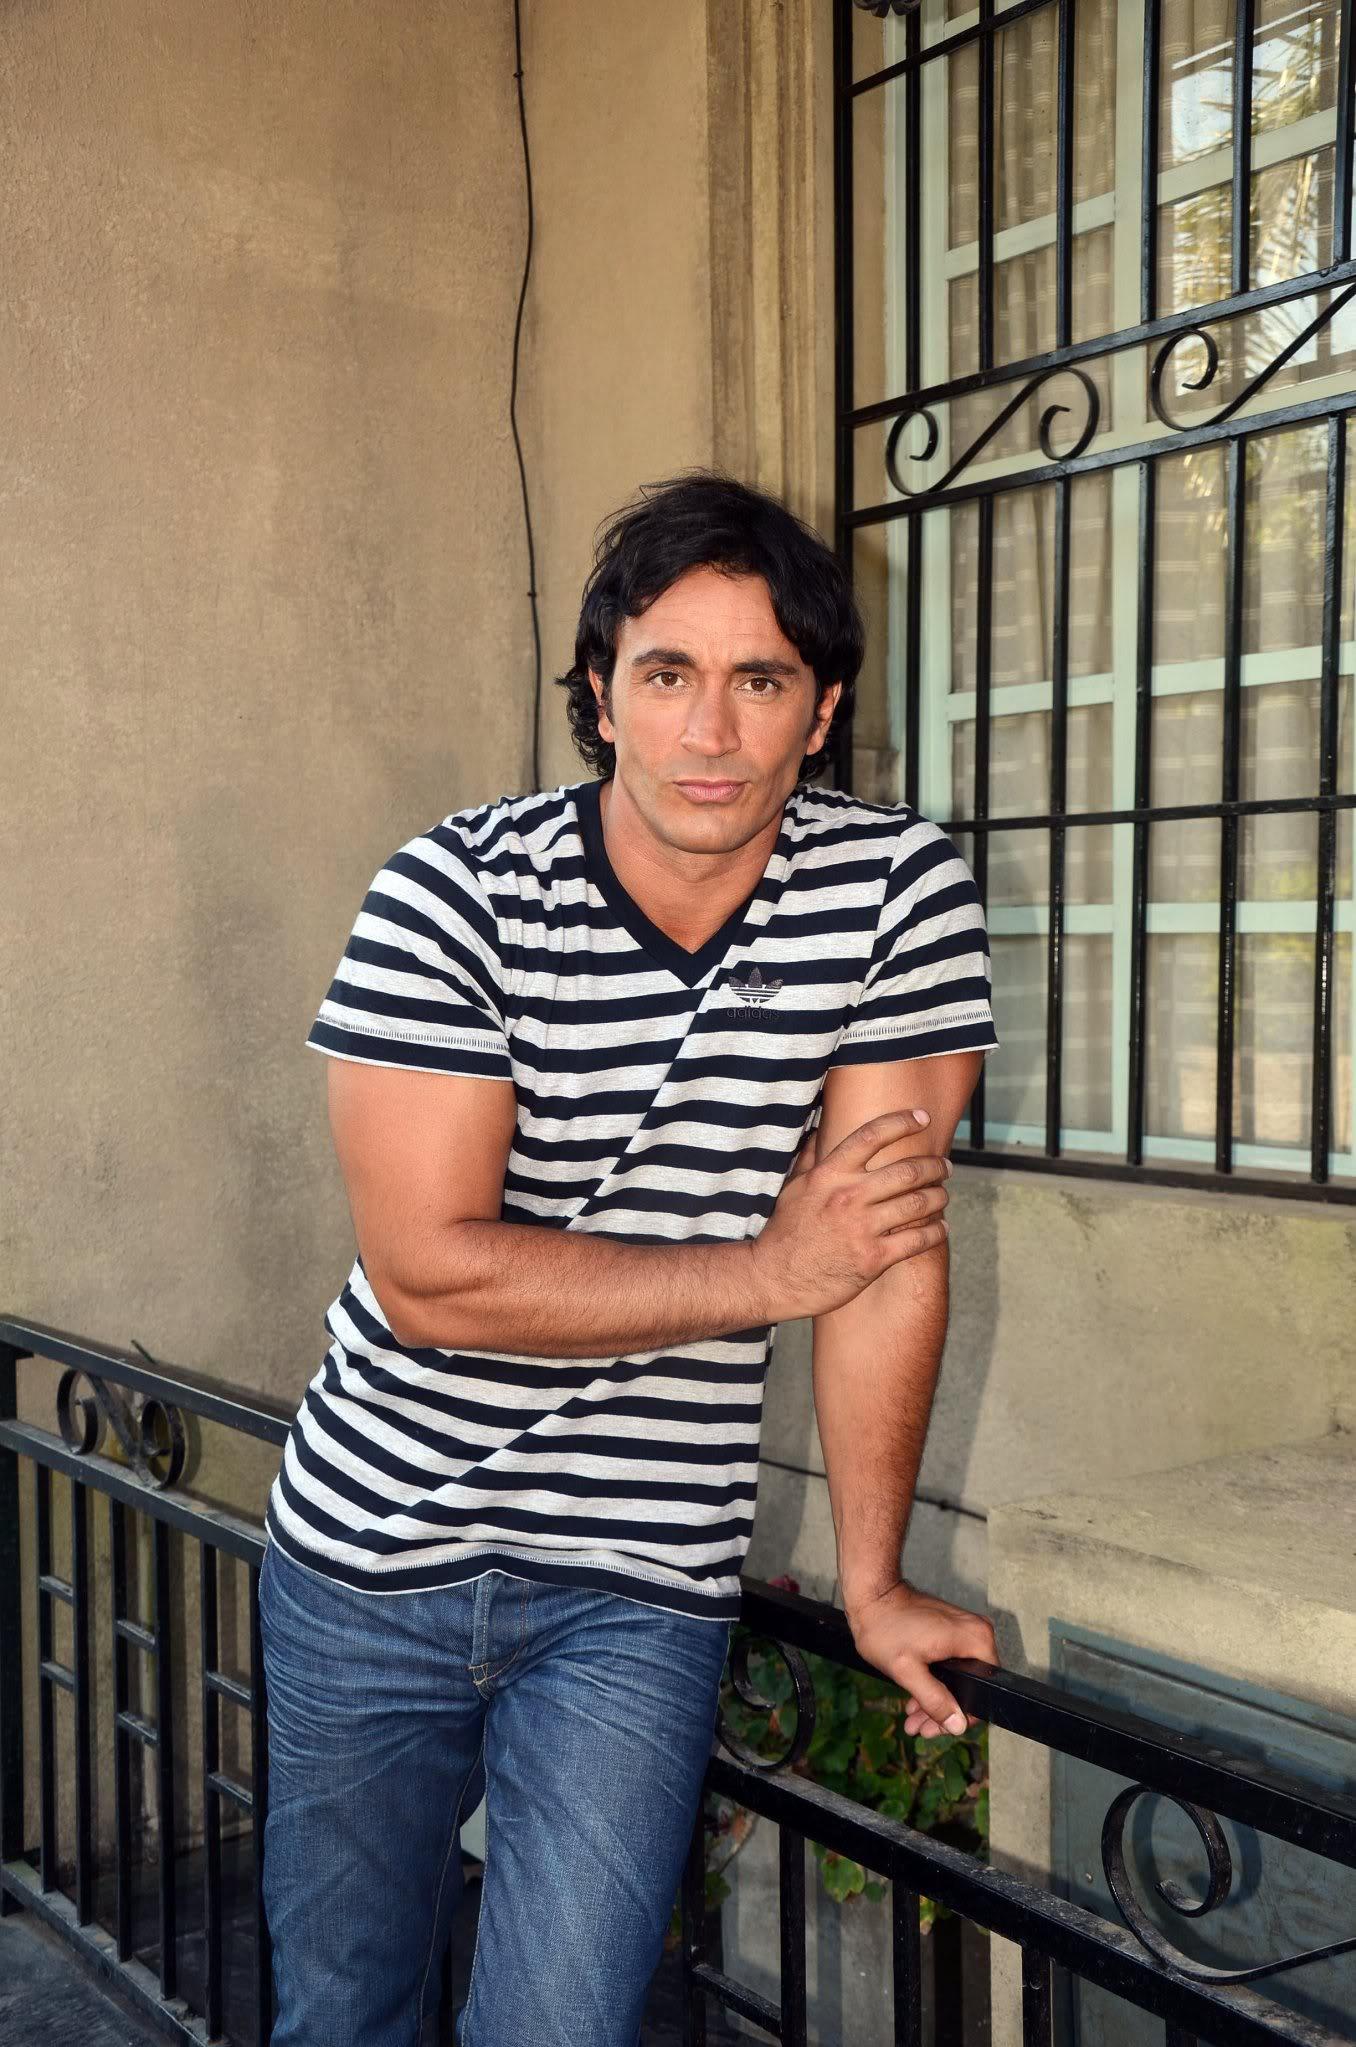 Аргентинские теленовеллы 2012 - Página 8 511440541